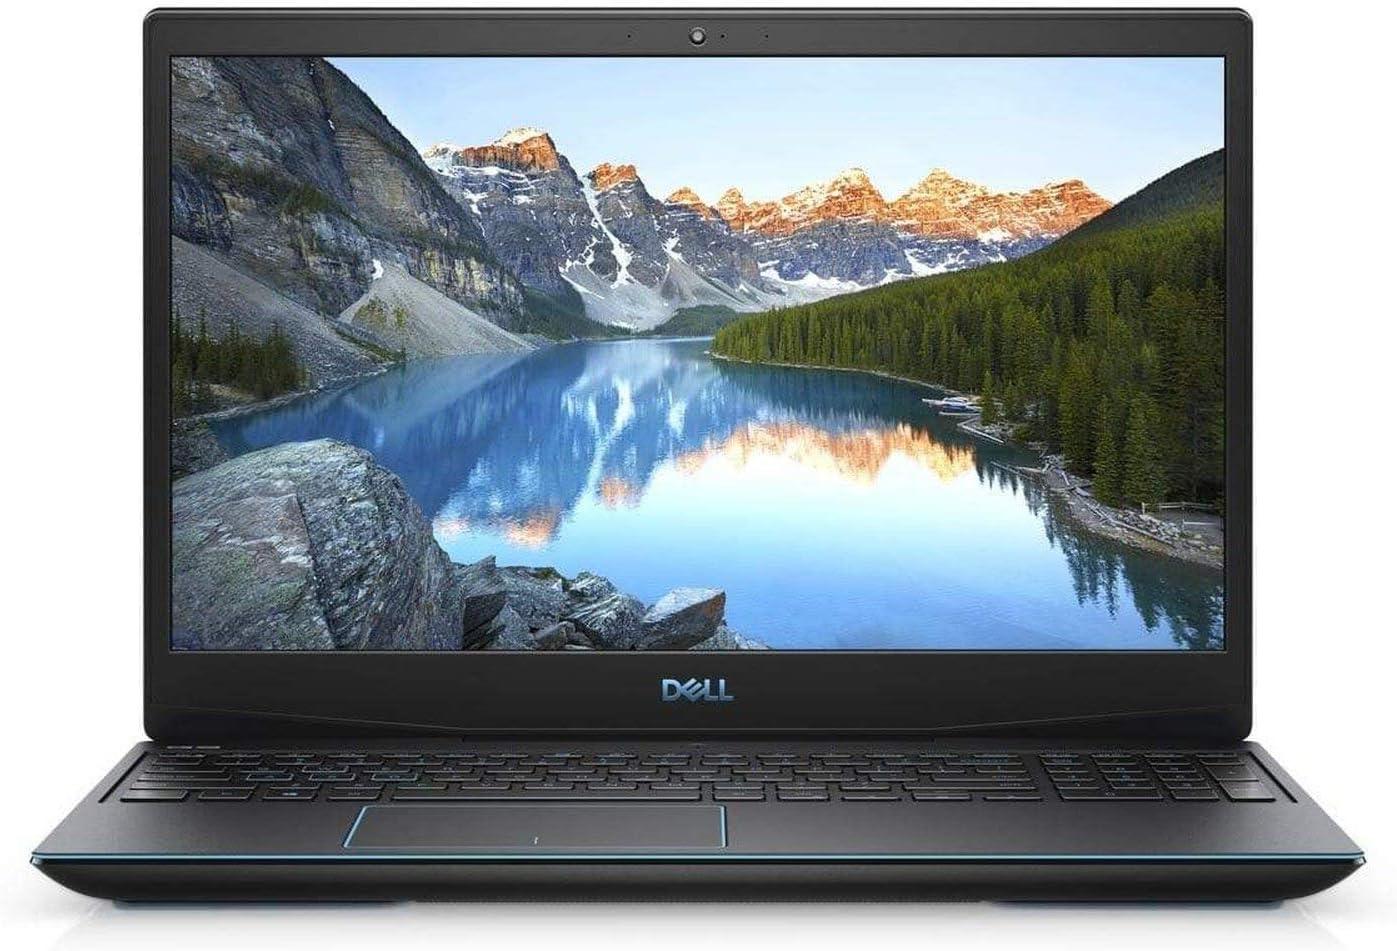 Dell G3 3590 Laptop 15.6 - Intel Core i5 9th Gen - i5-9300H - Quad Core 4.1Ghz - 512GB SSD - 8GB RAM - Nvidia GeForce GTX 1660 Ti - 1920x1080 FHD - Windows 10 Home (Renewed)